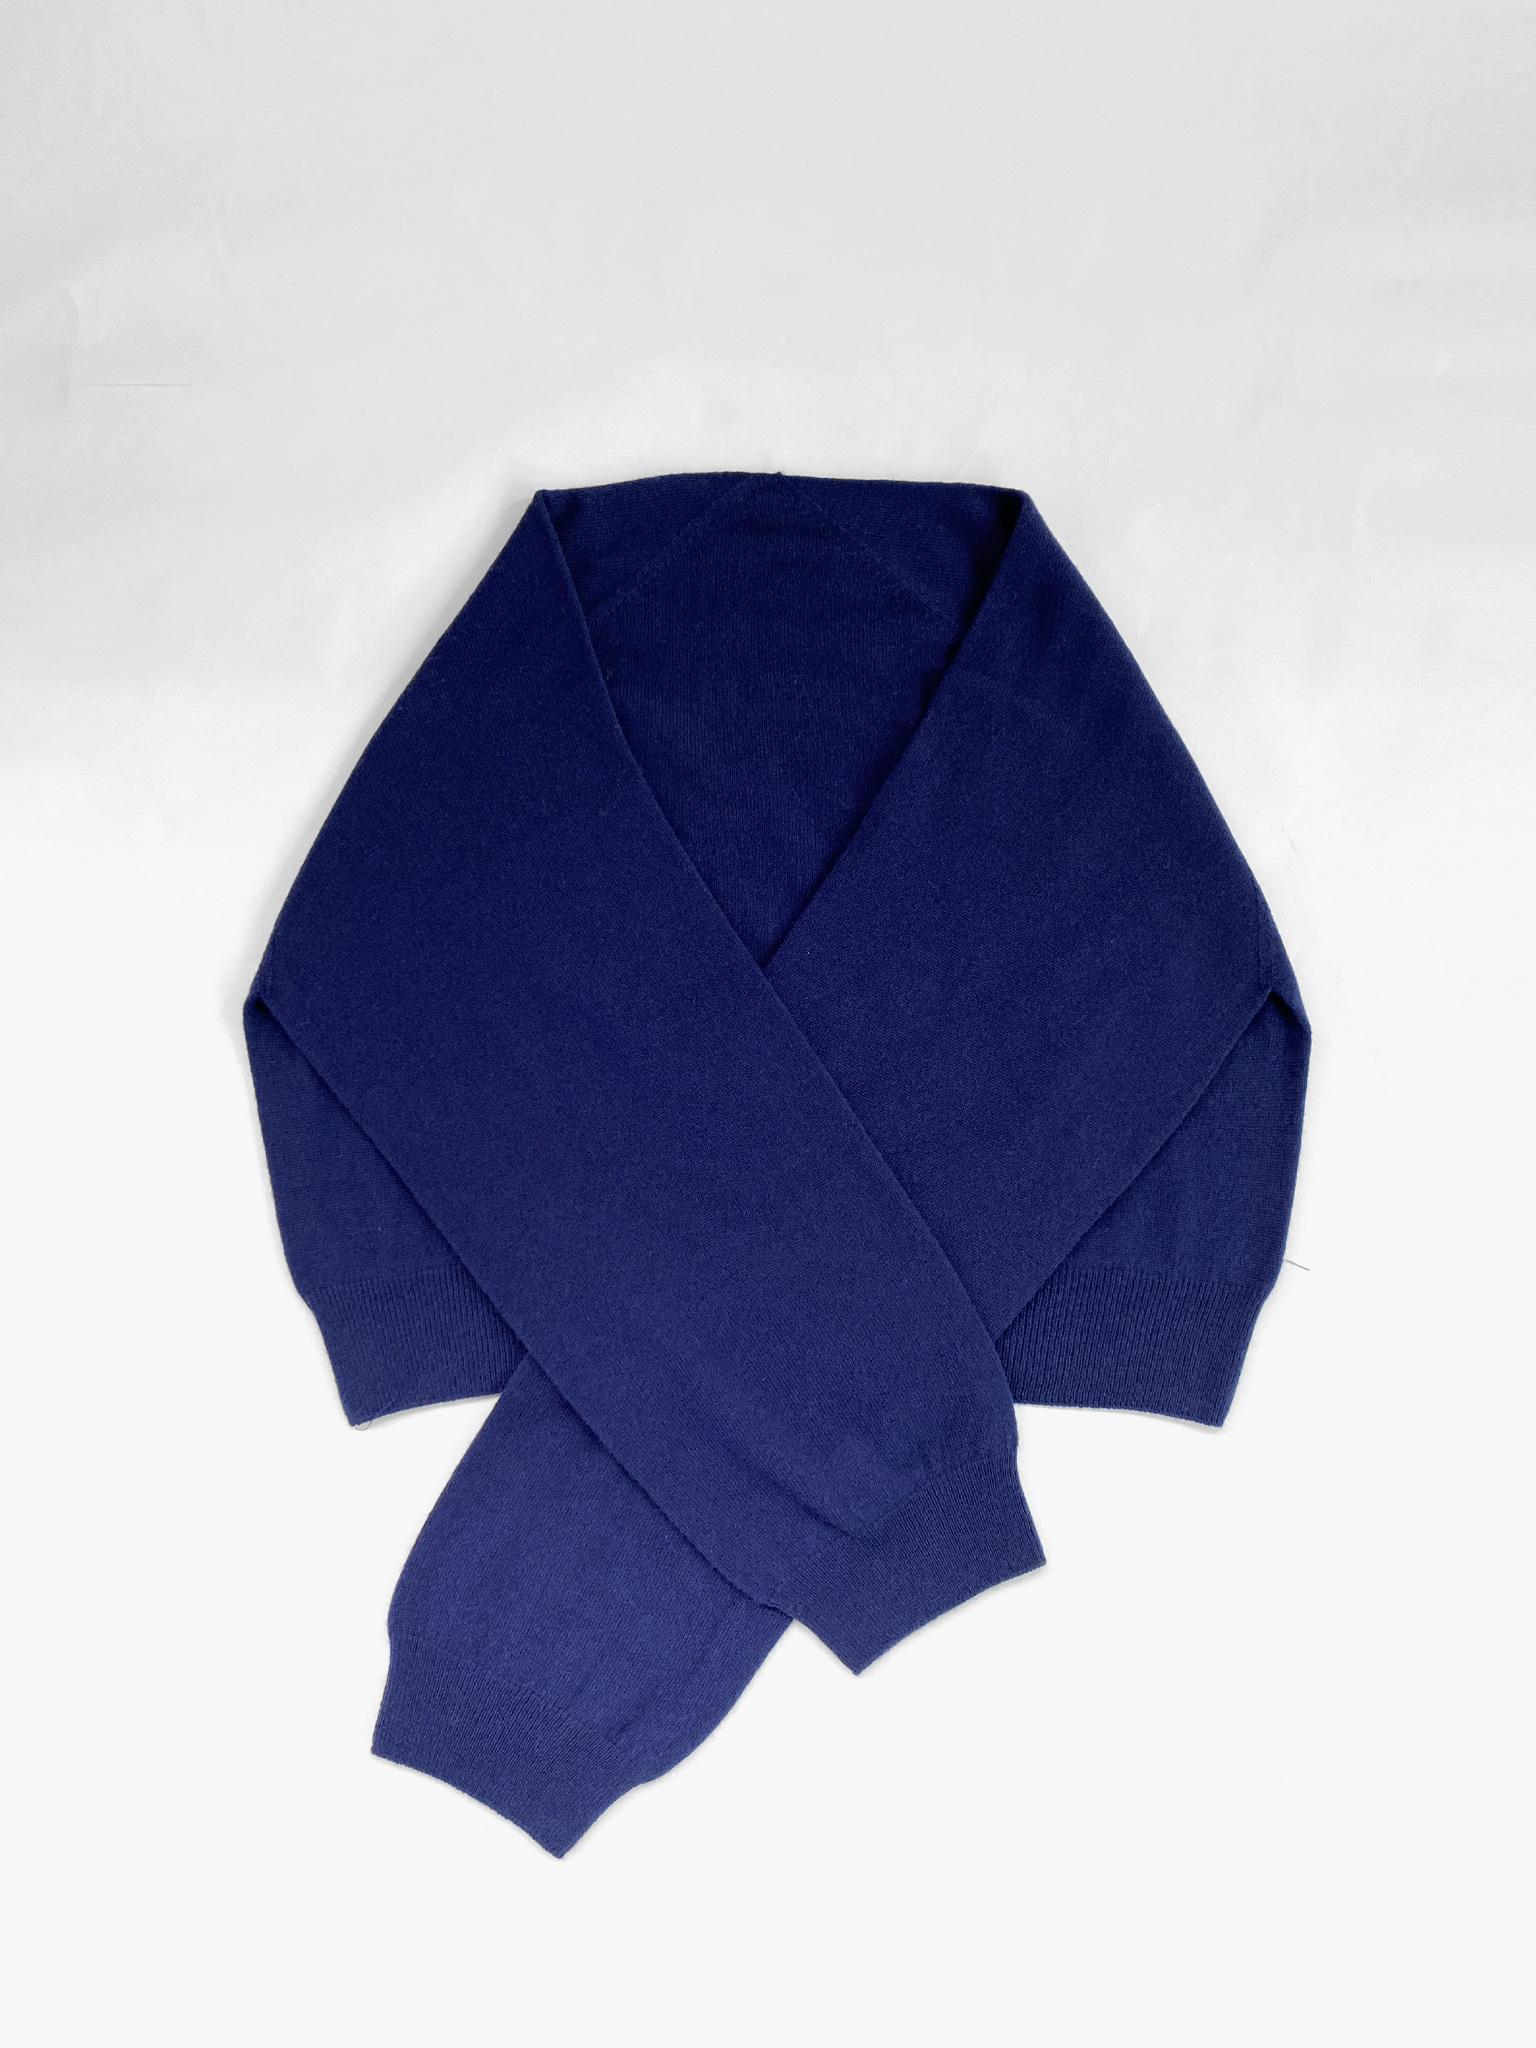 ROYAL Collection. Loro Piana Cashmere 100% Wholegarment Shawl Muffler